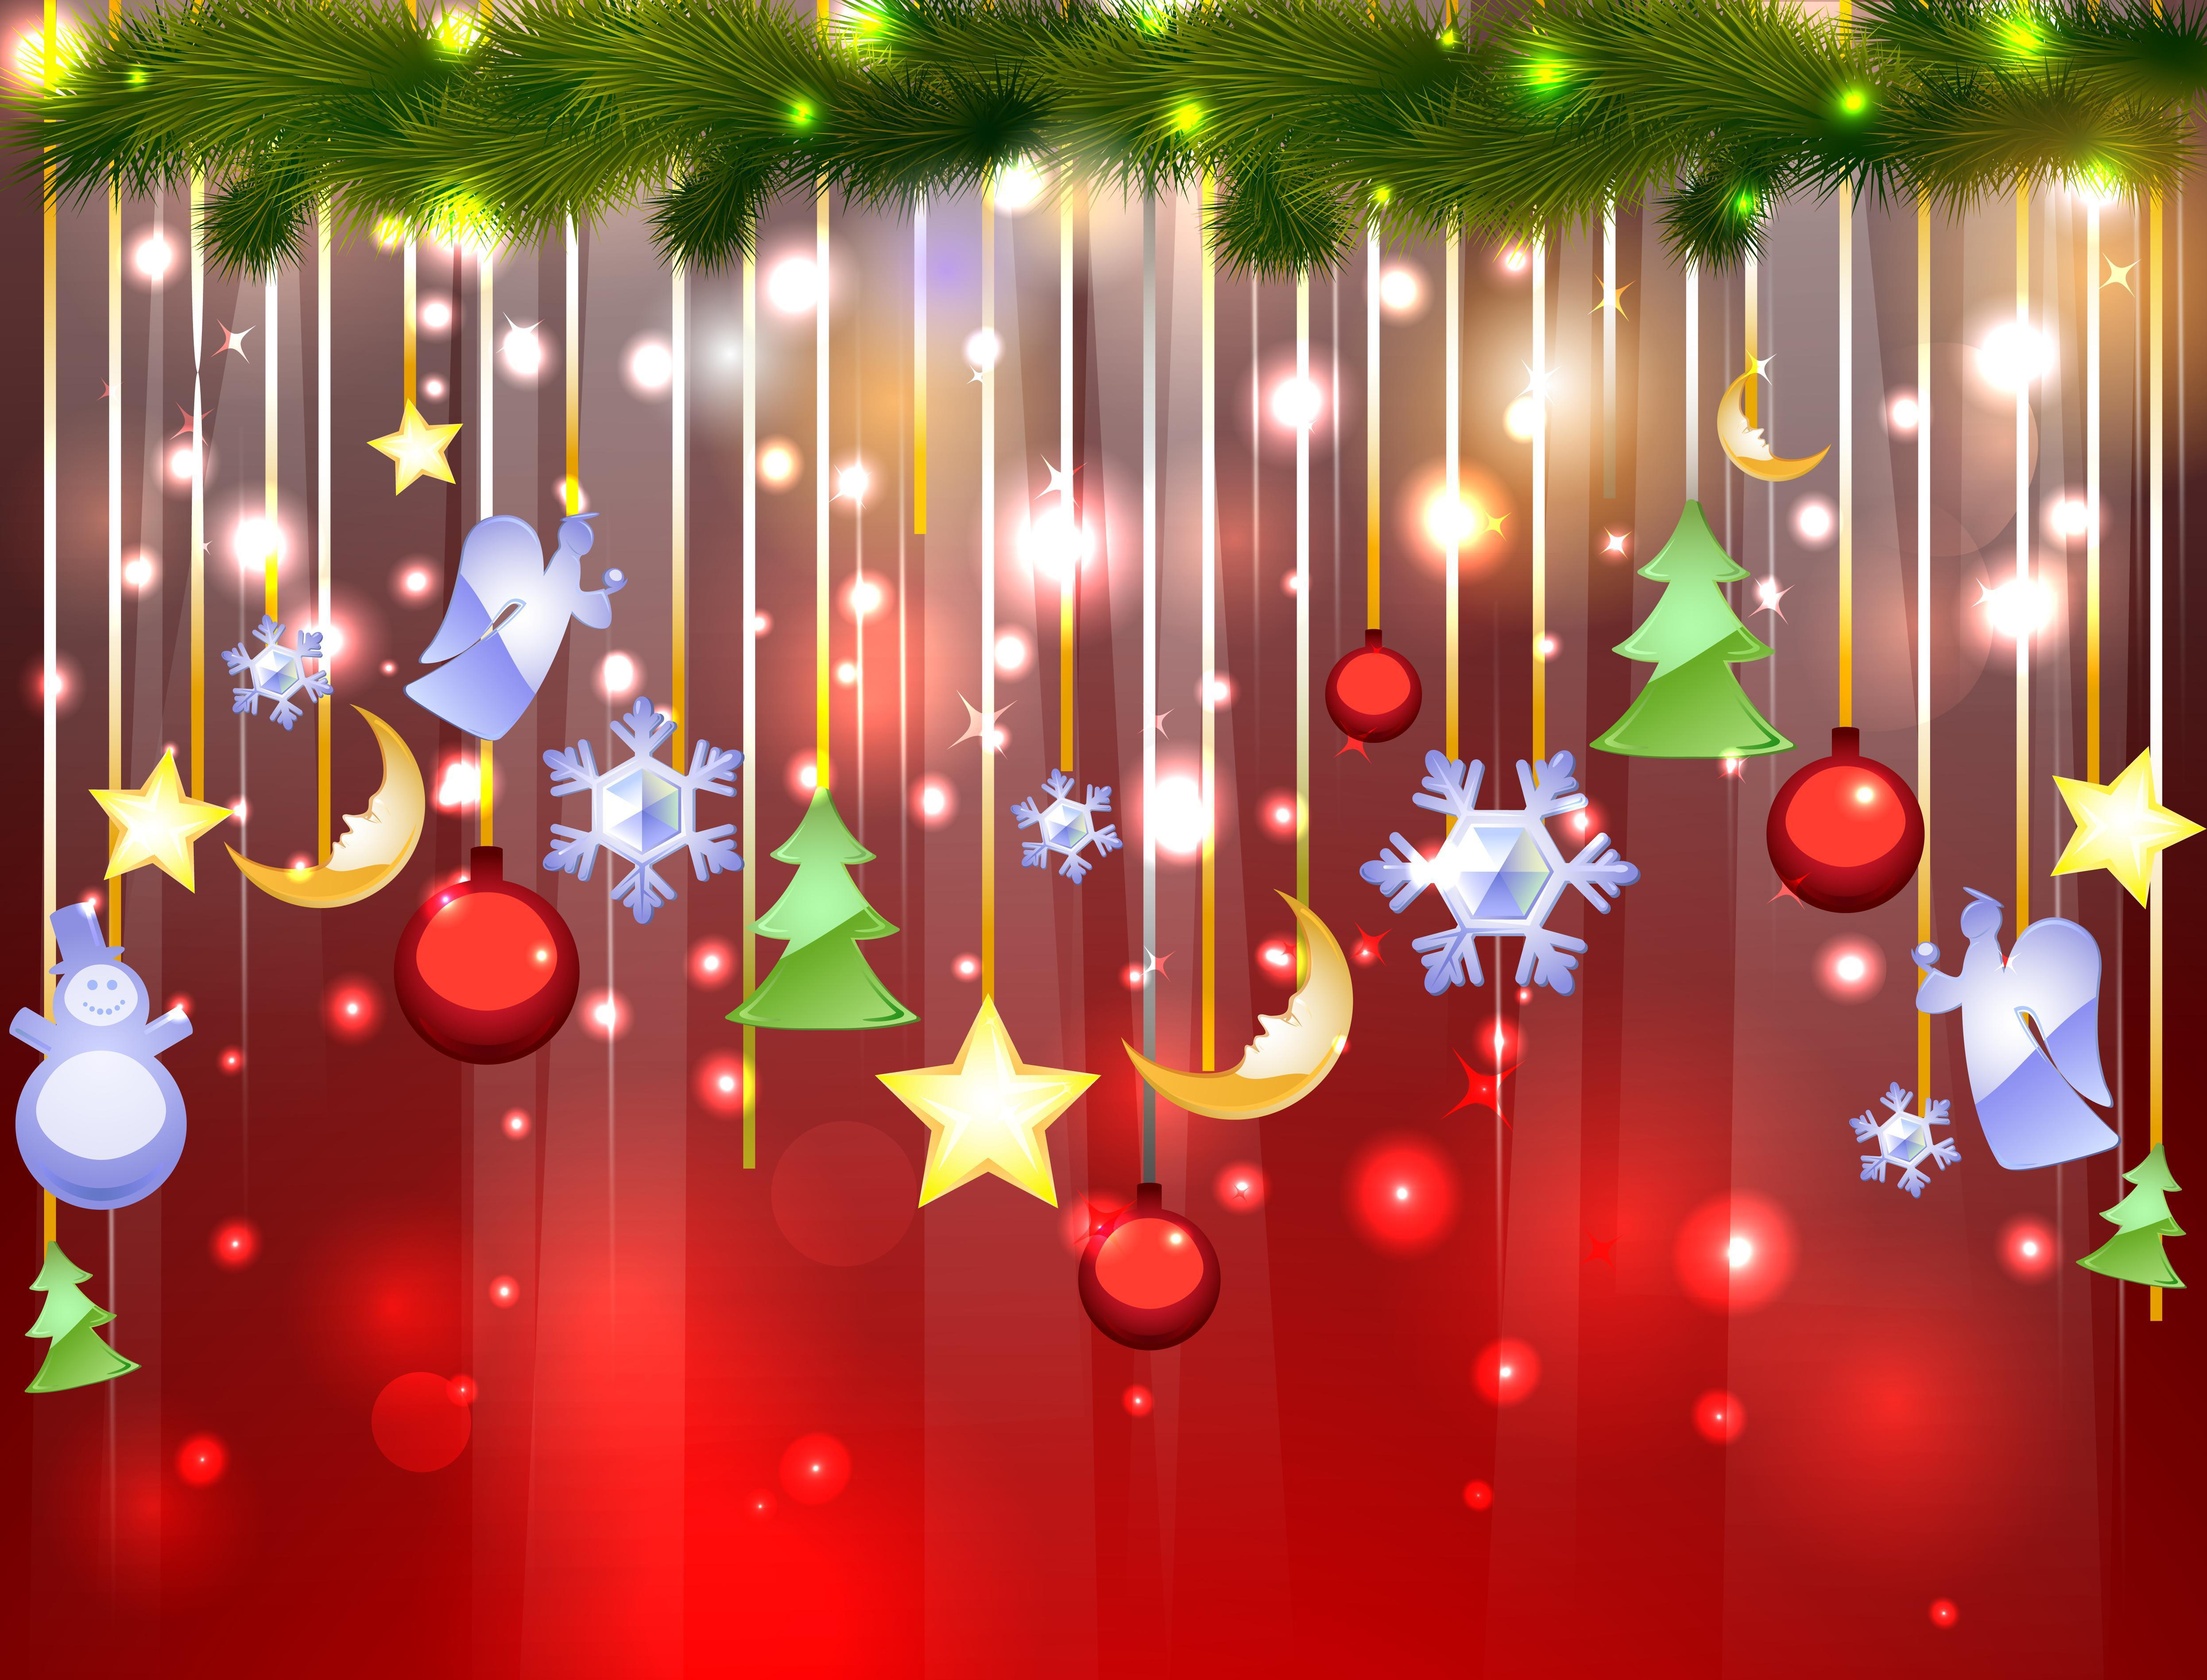 Christmas theme Desktop wallpapers 1600x1200 4984x3794